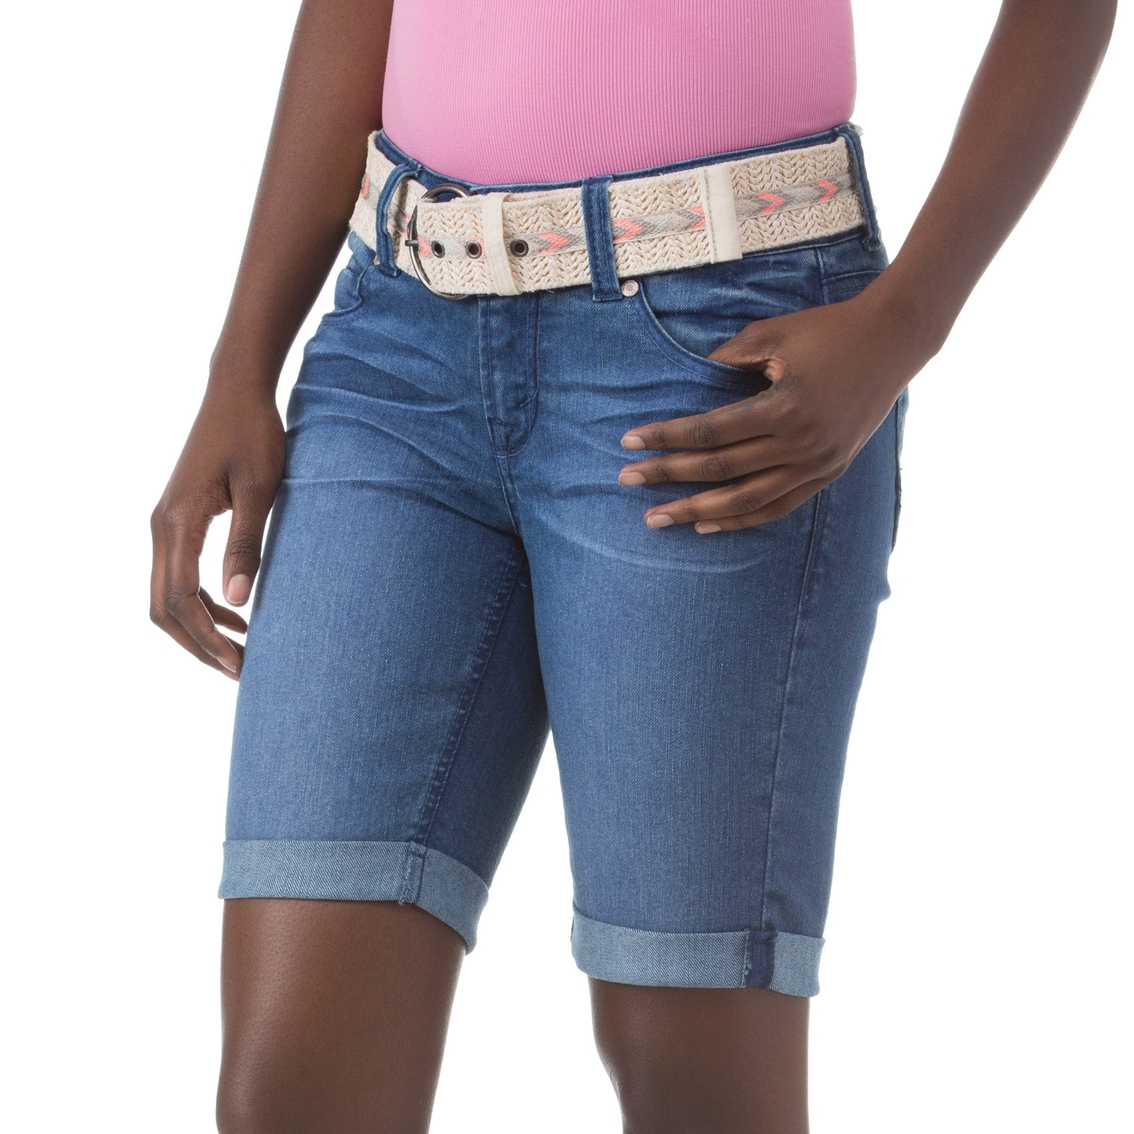 a4f483b82d Wallflower Juniors Mickey Color Pop Belted Bermuda Shorts | Juniors ...